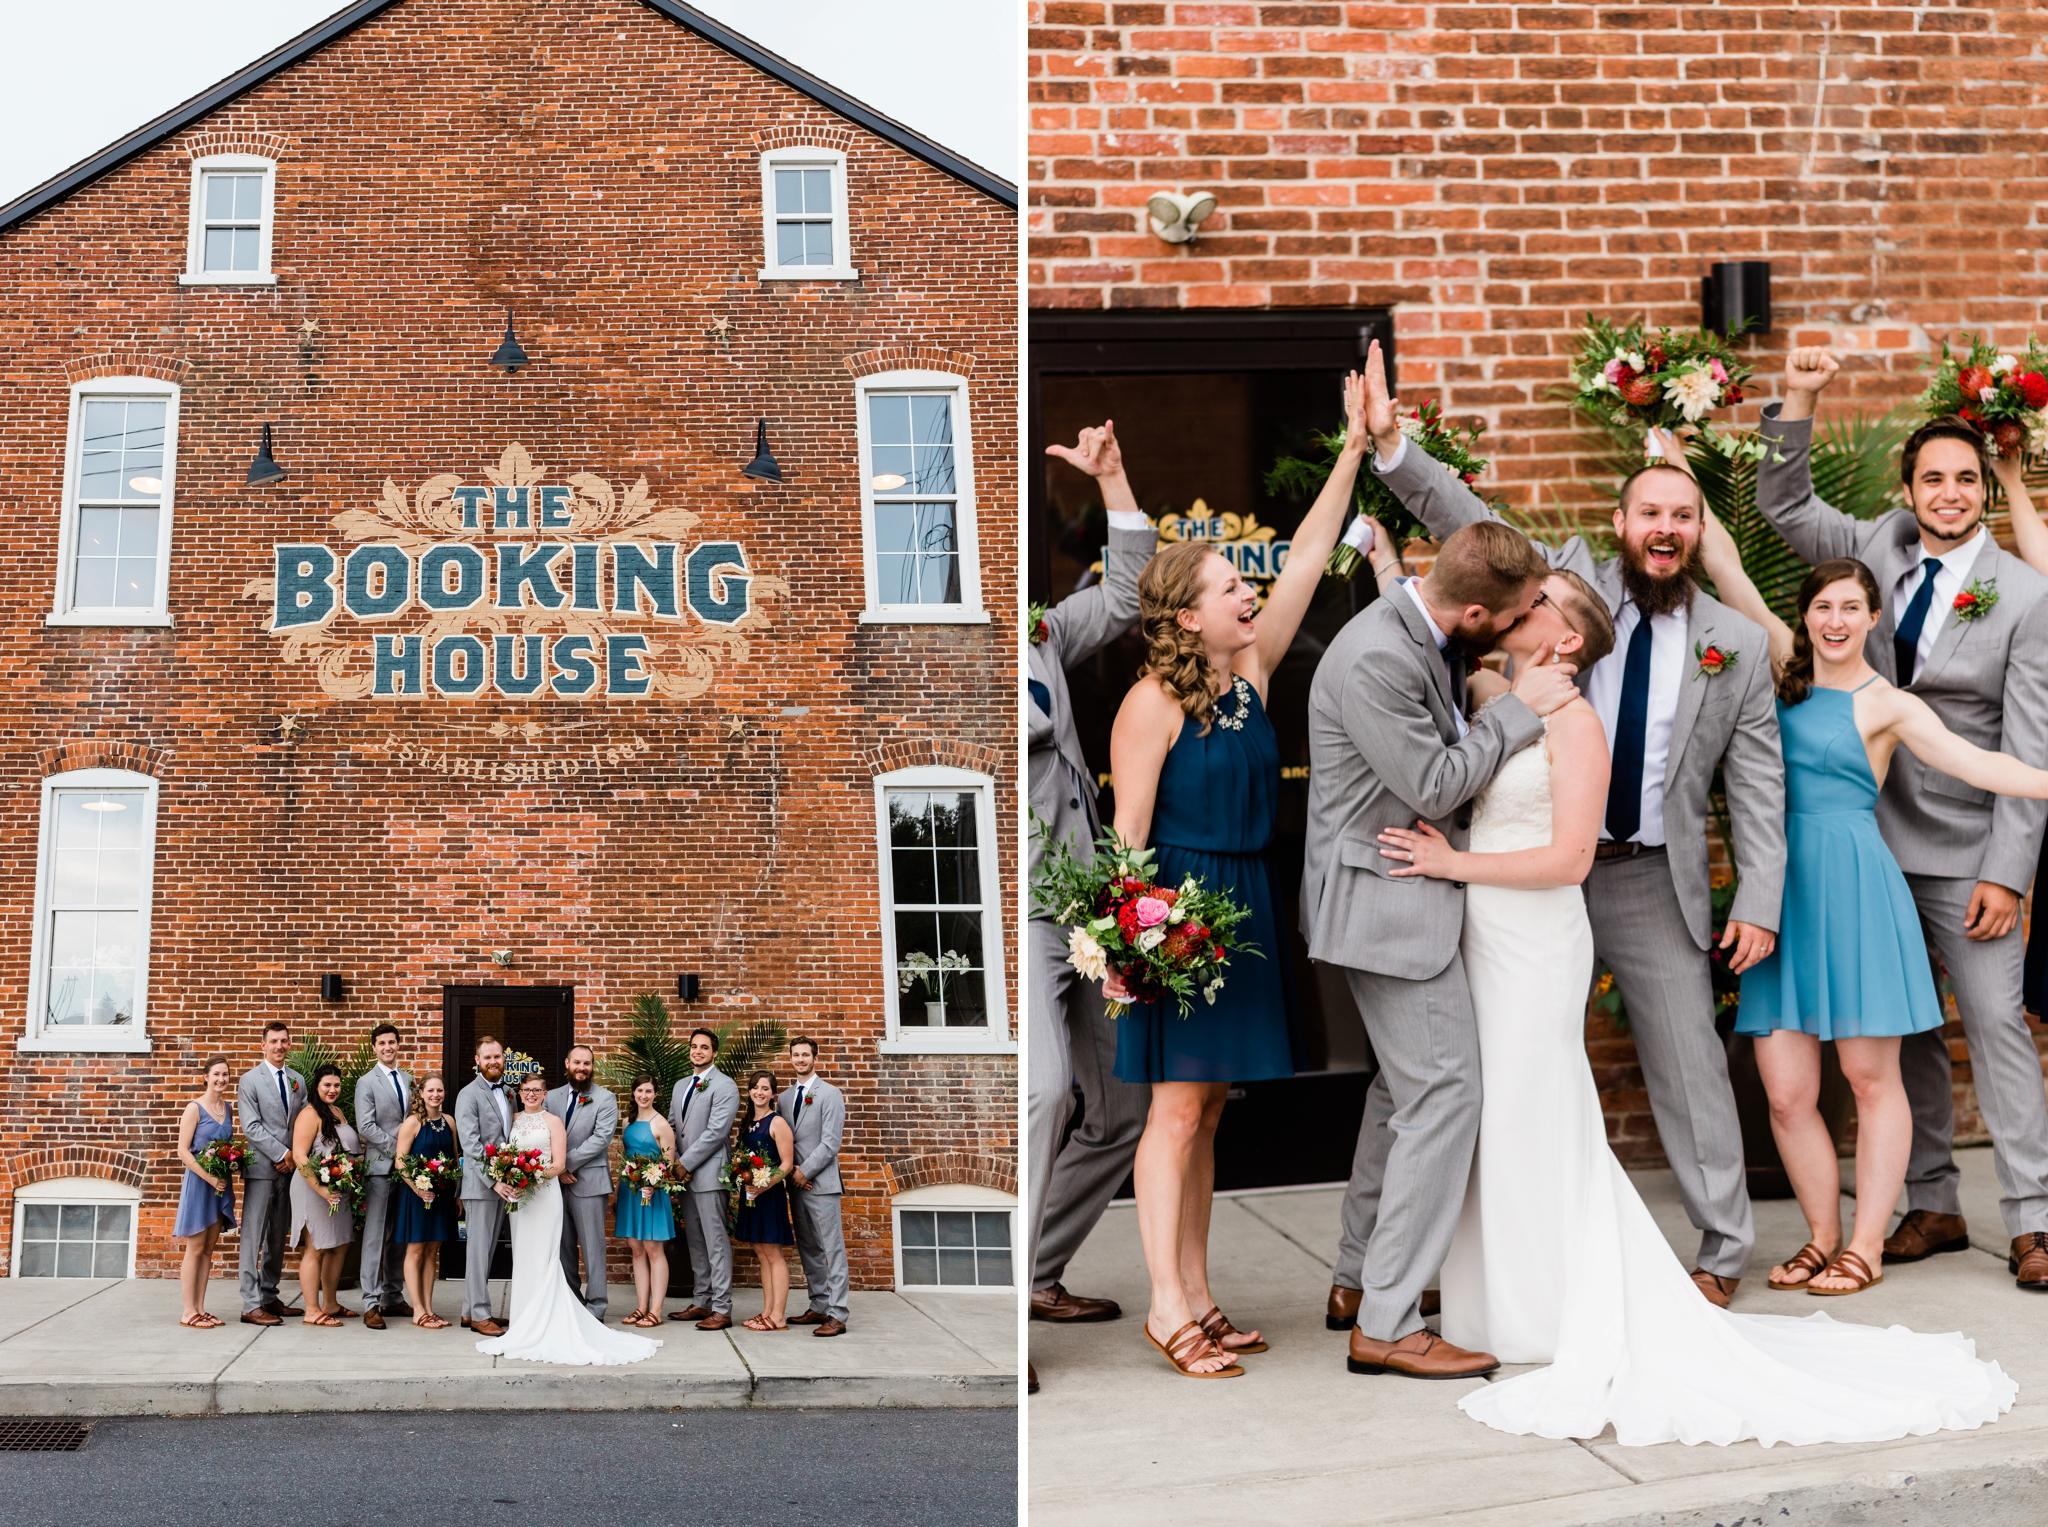 Emily Grace Photography, Lancaster PA Wedding Photographer, The Booking House Wedding Venue, Manheim PA Wedding Venue, The Booking House Manheim Wedding Party Photos, Central PA Wedding Photographer